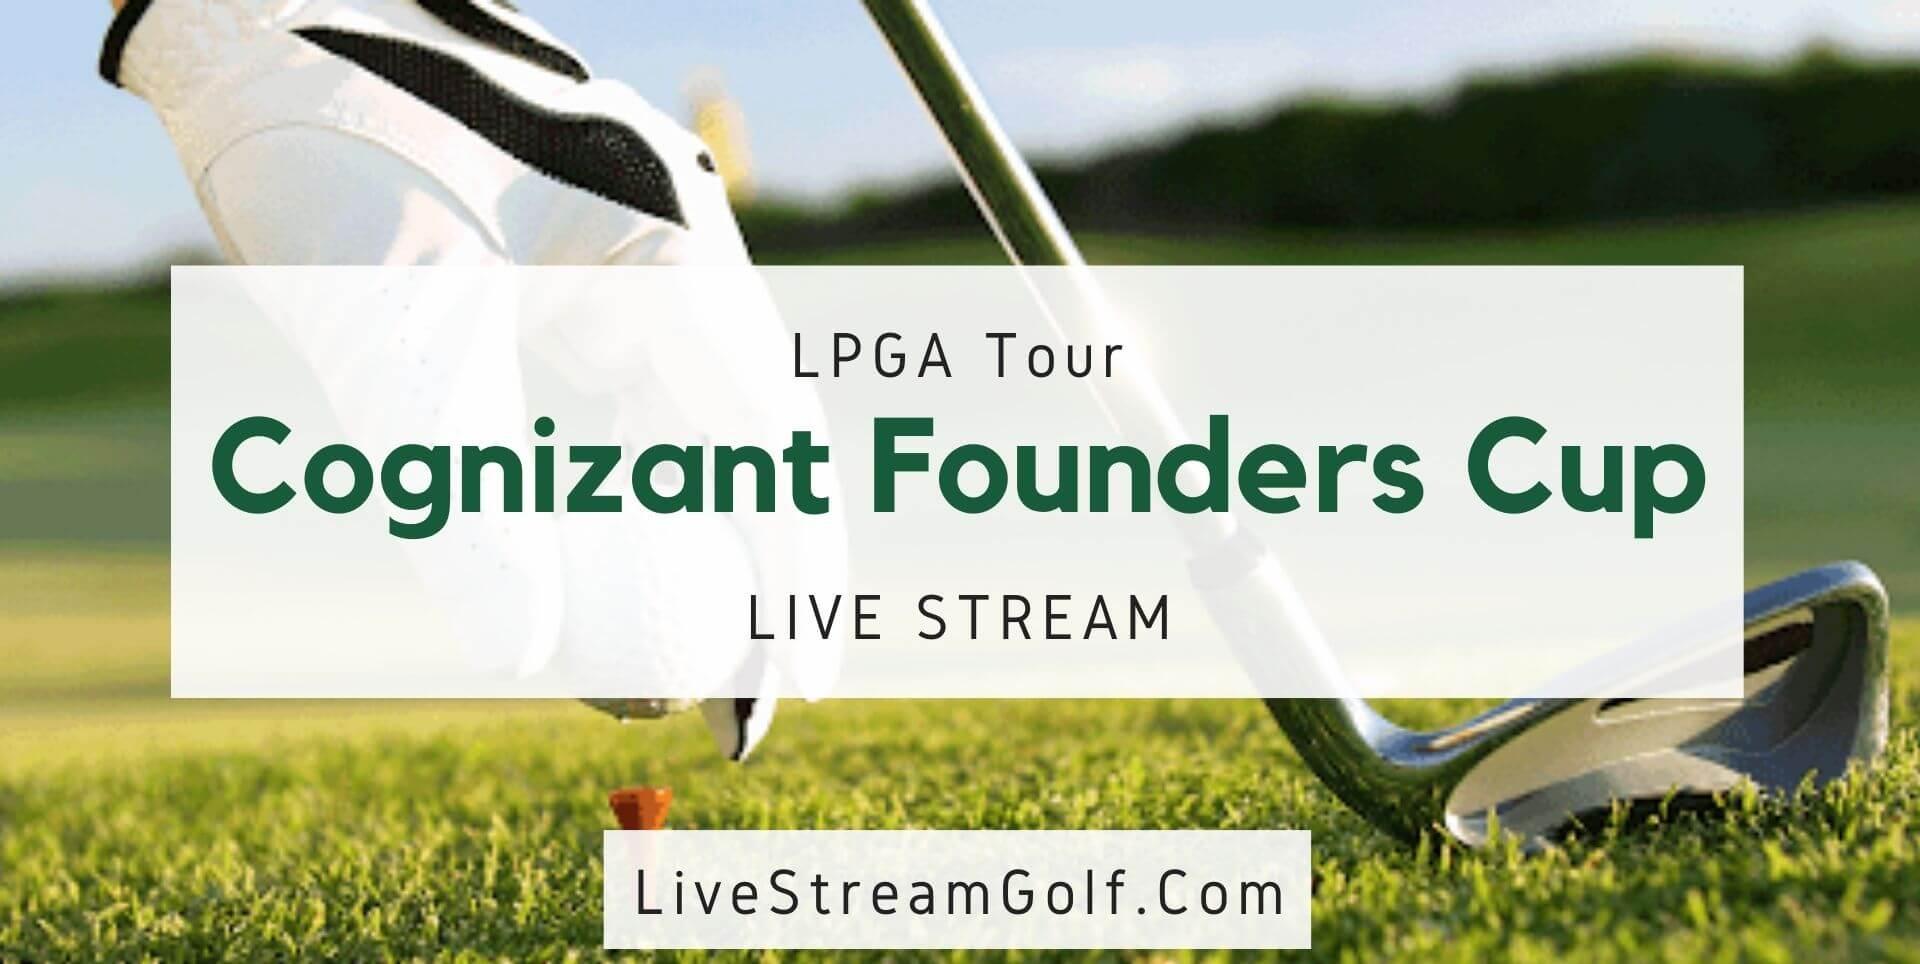 Cognizant Founders Cup Rd 4 Live Stream: LPGA Tour 2021